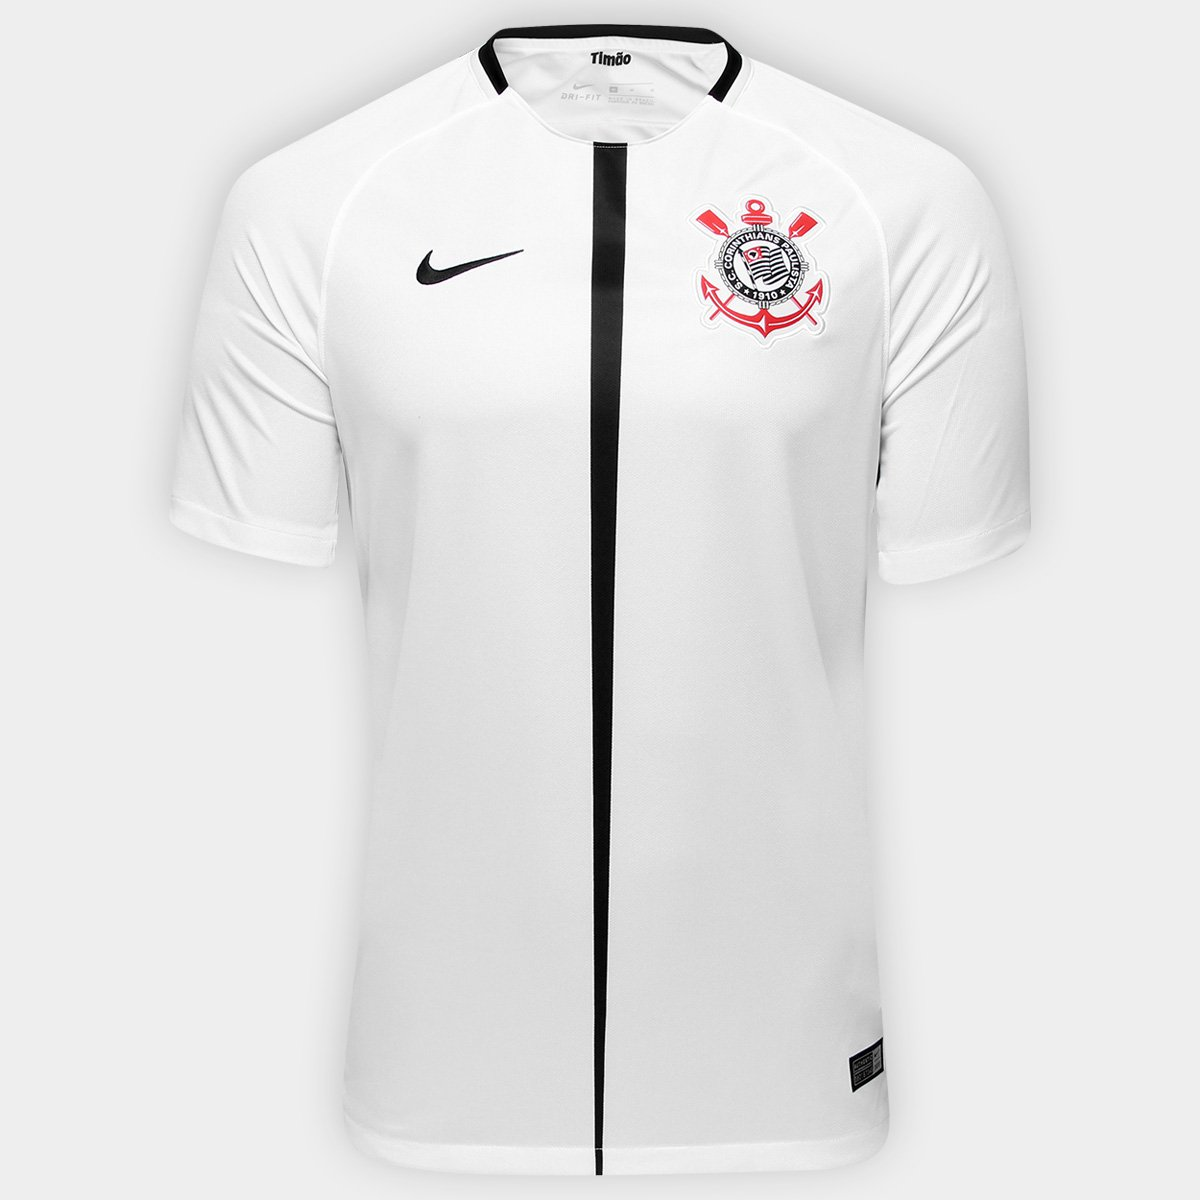 def0b8de0b Camisa Corinthians I 17 18 s nº Torcedor Nike Masculina